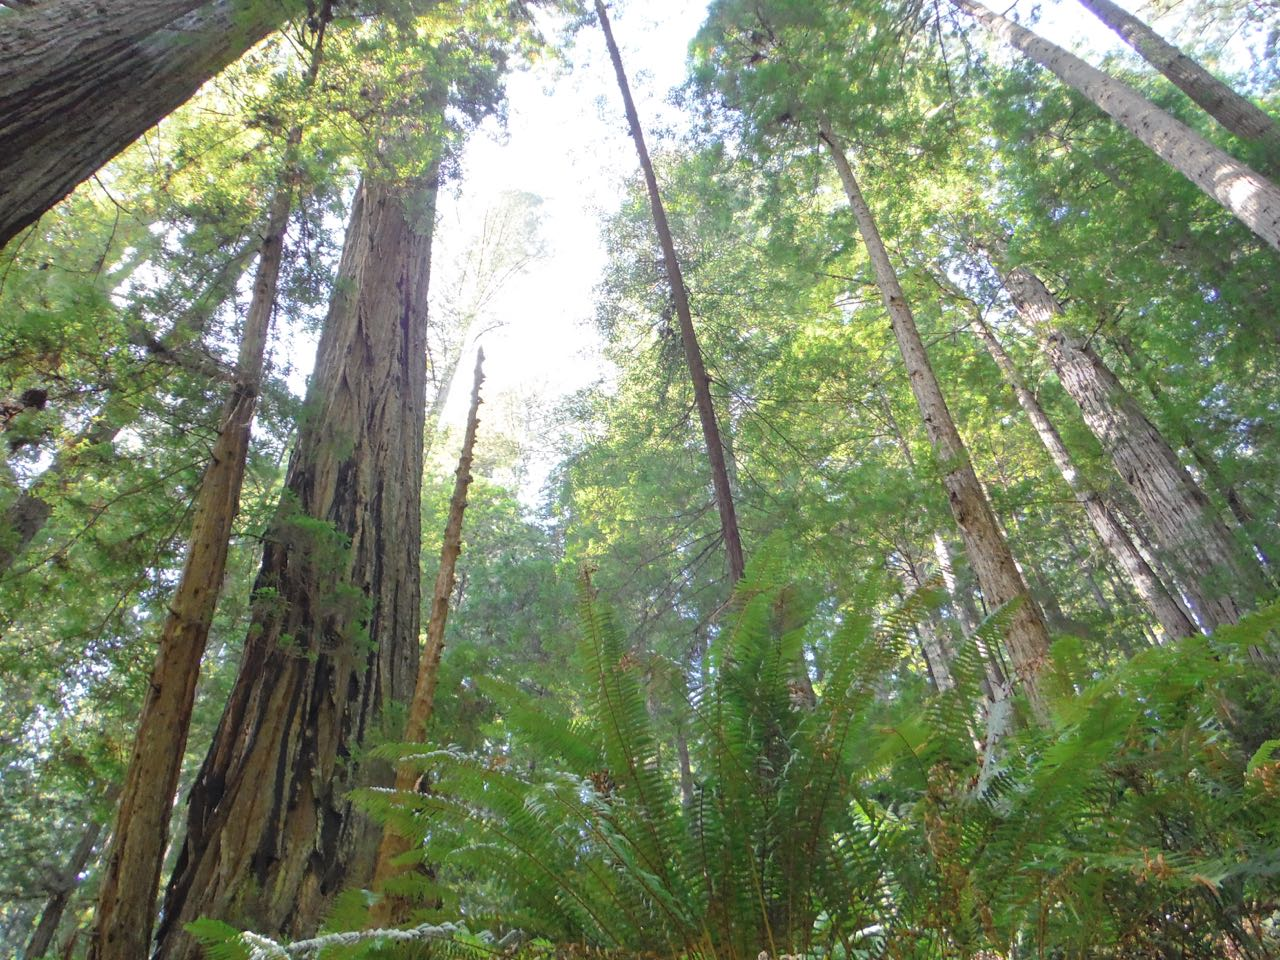 Redwoods 2017 10 08 263 Of 287